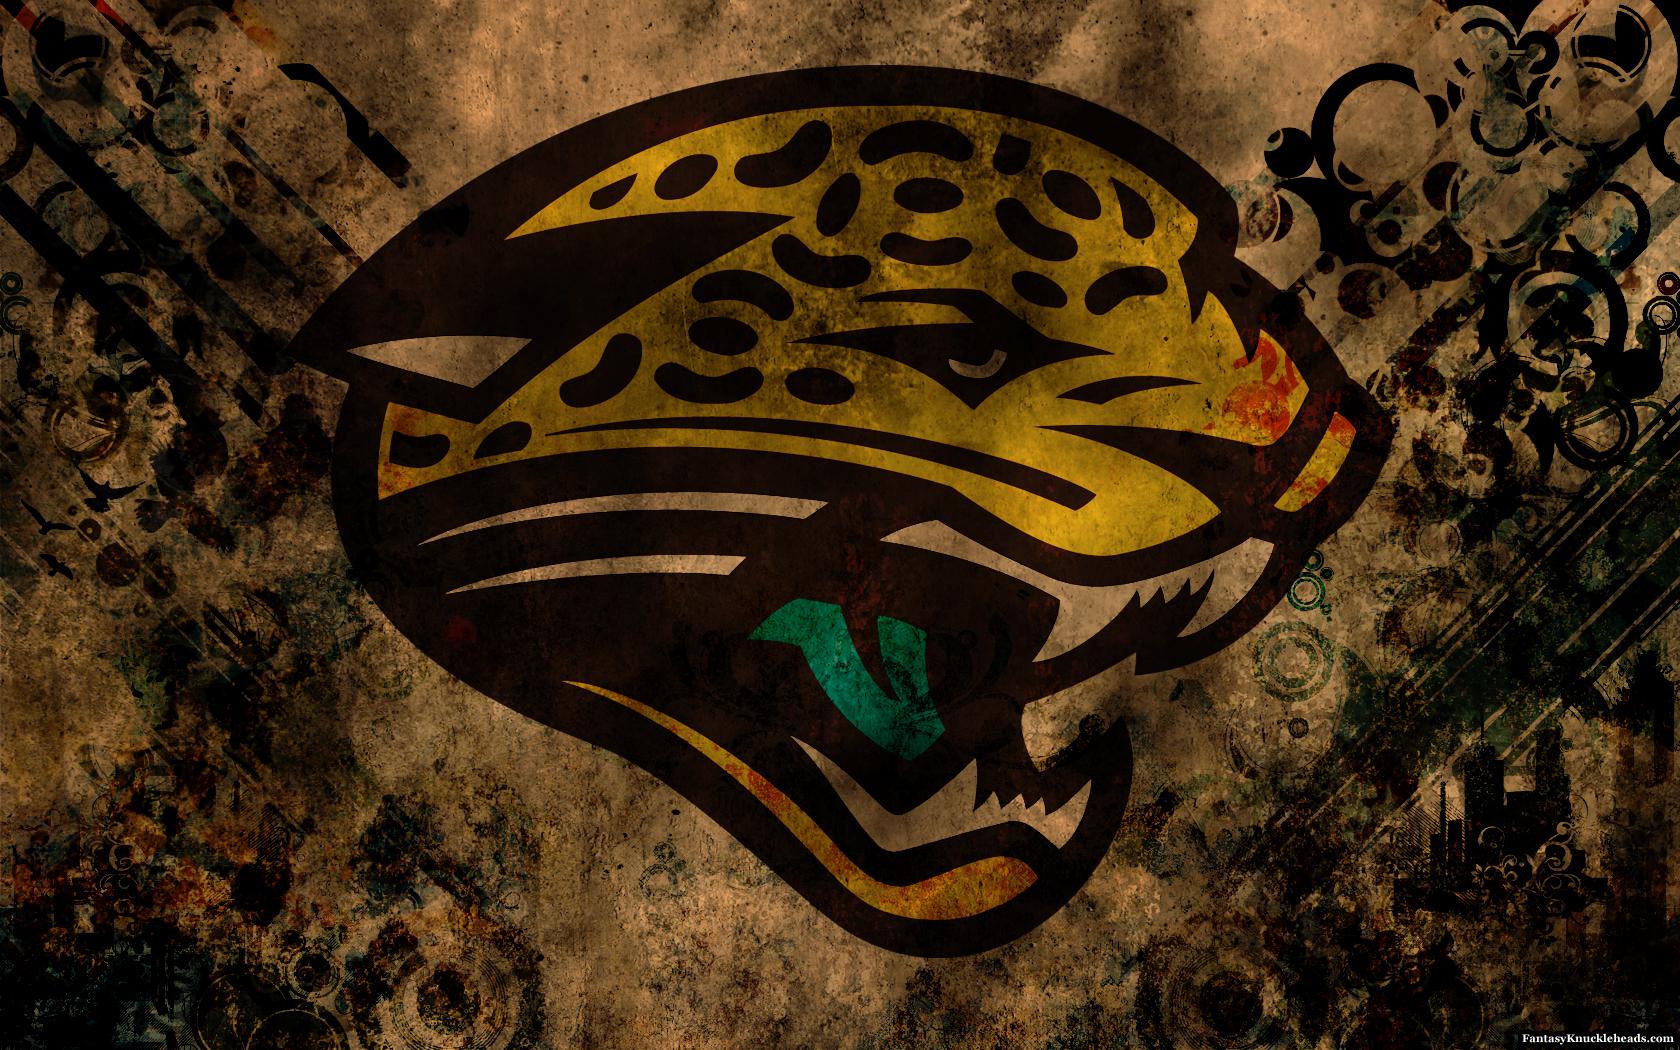 Jacksonville Jaguars Desktop Wallpaperjpg 2012 06 14 1128 21M 1680x1050